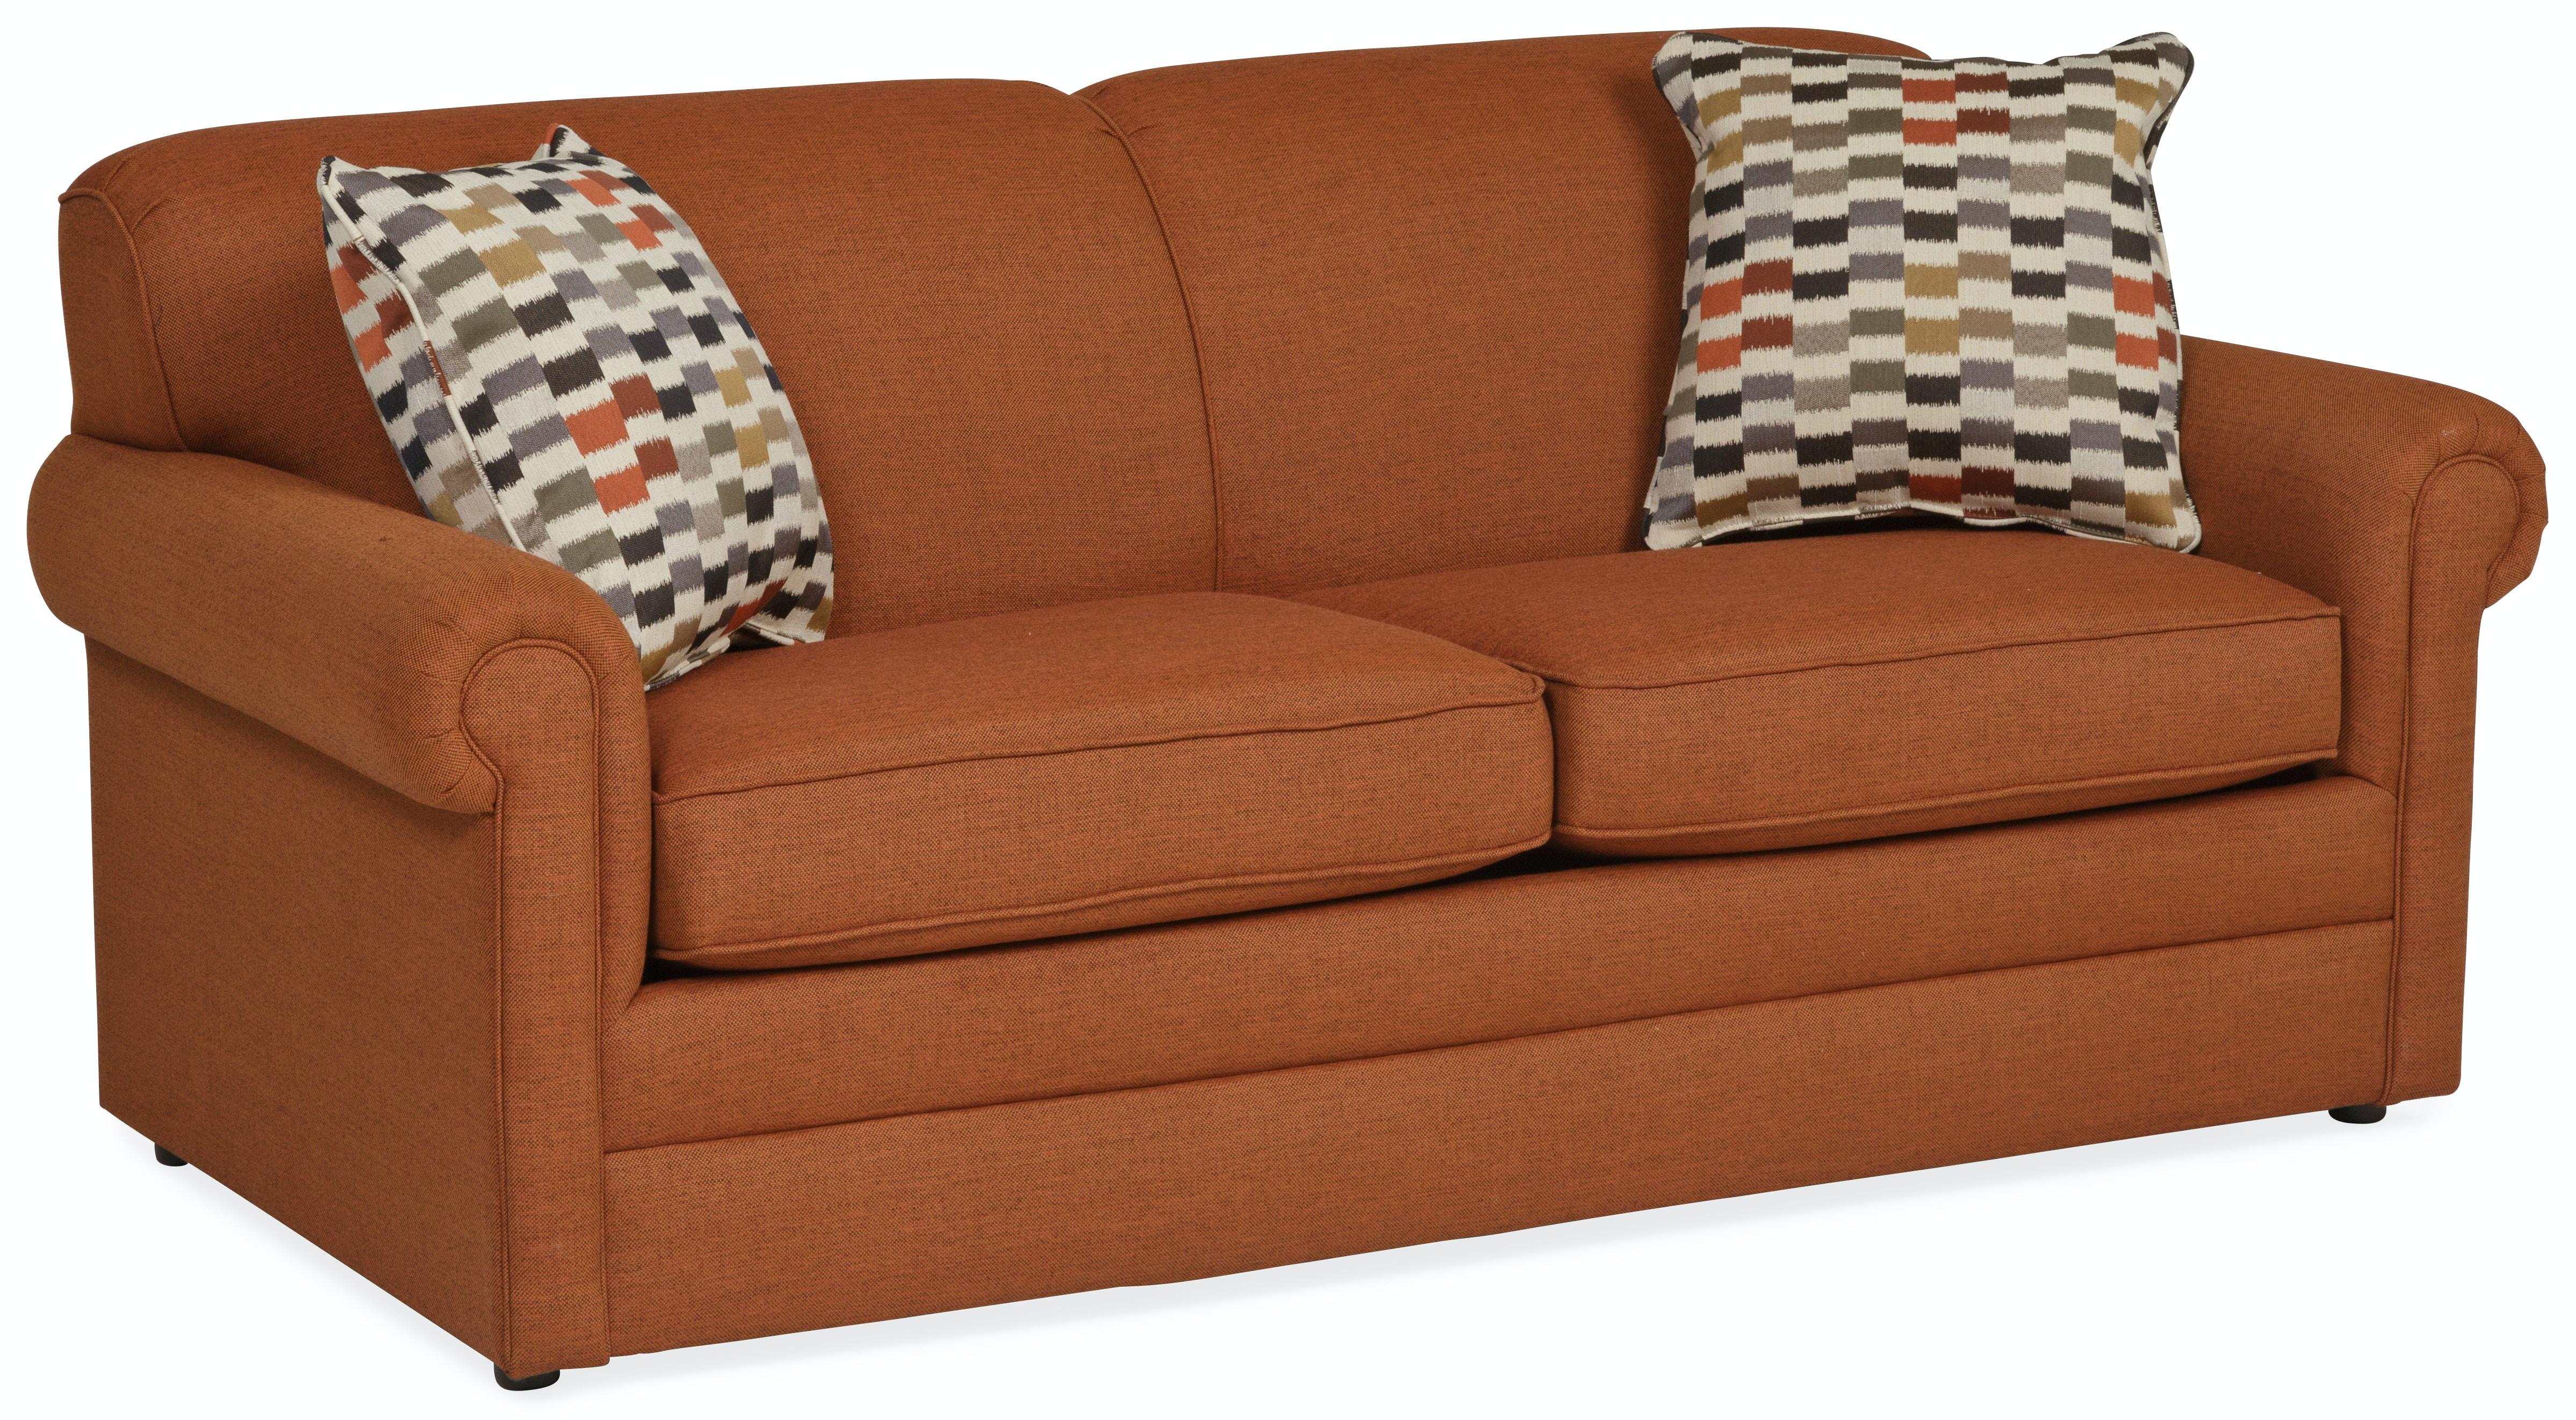 Kerry Full Air Mattress Sleeper Sofa   COPPER ST:507358